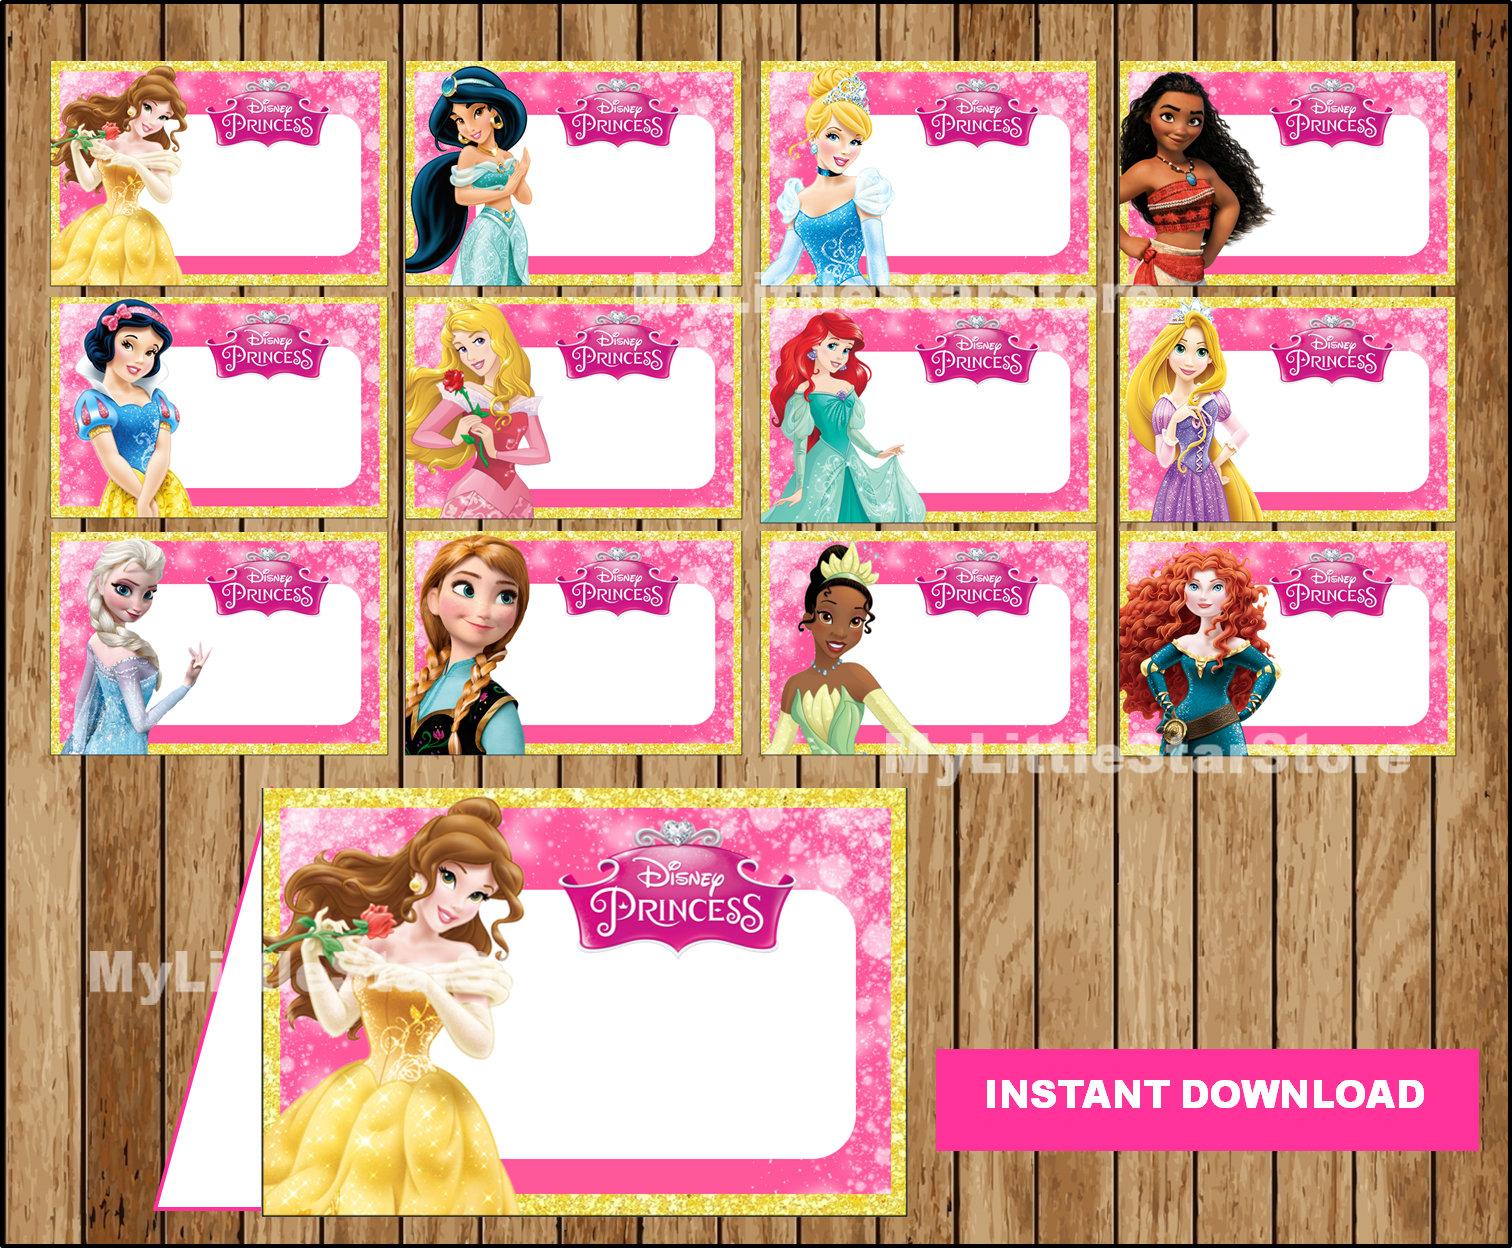 Disney Princess Food Labels Printable Disney Princess Food Tent Cards Disney Princess Party Food Labels Instant